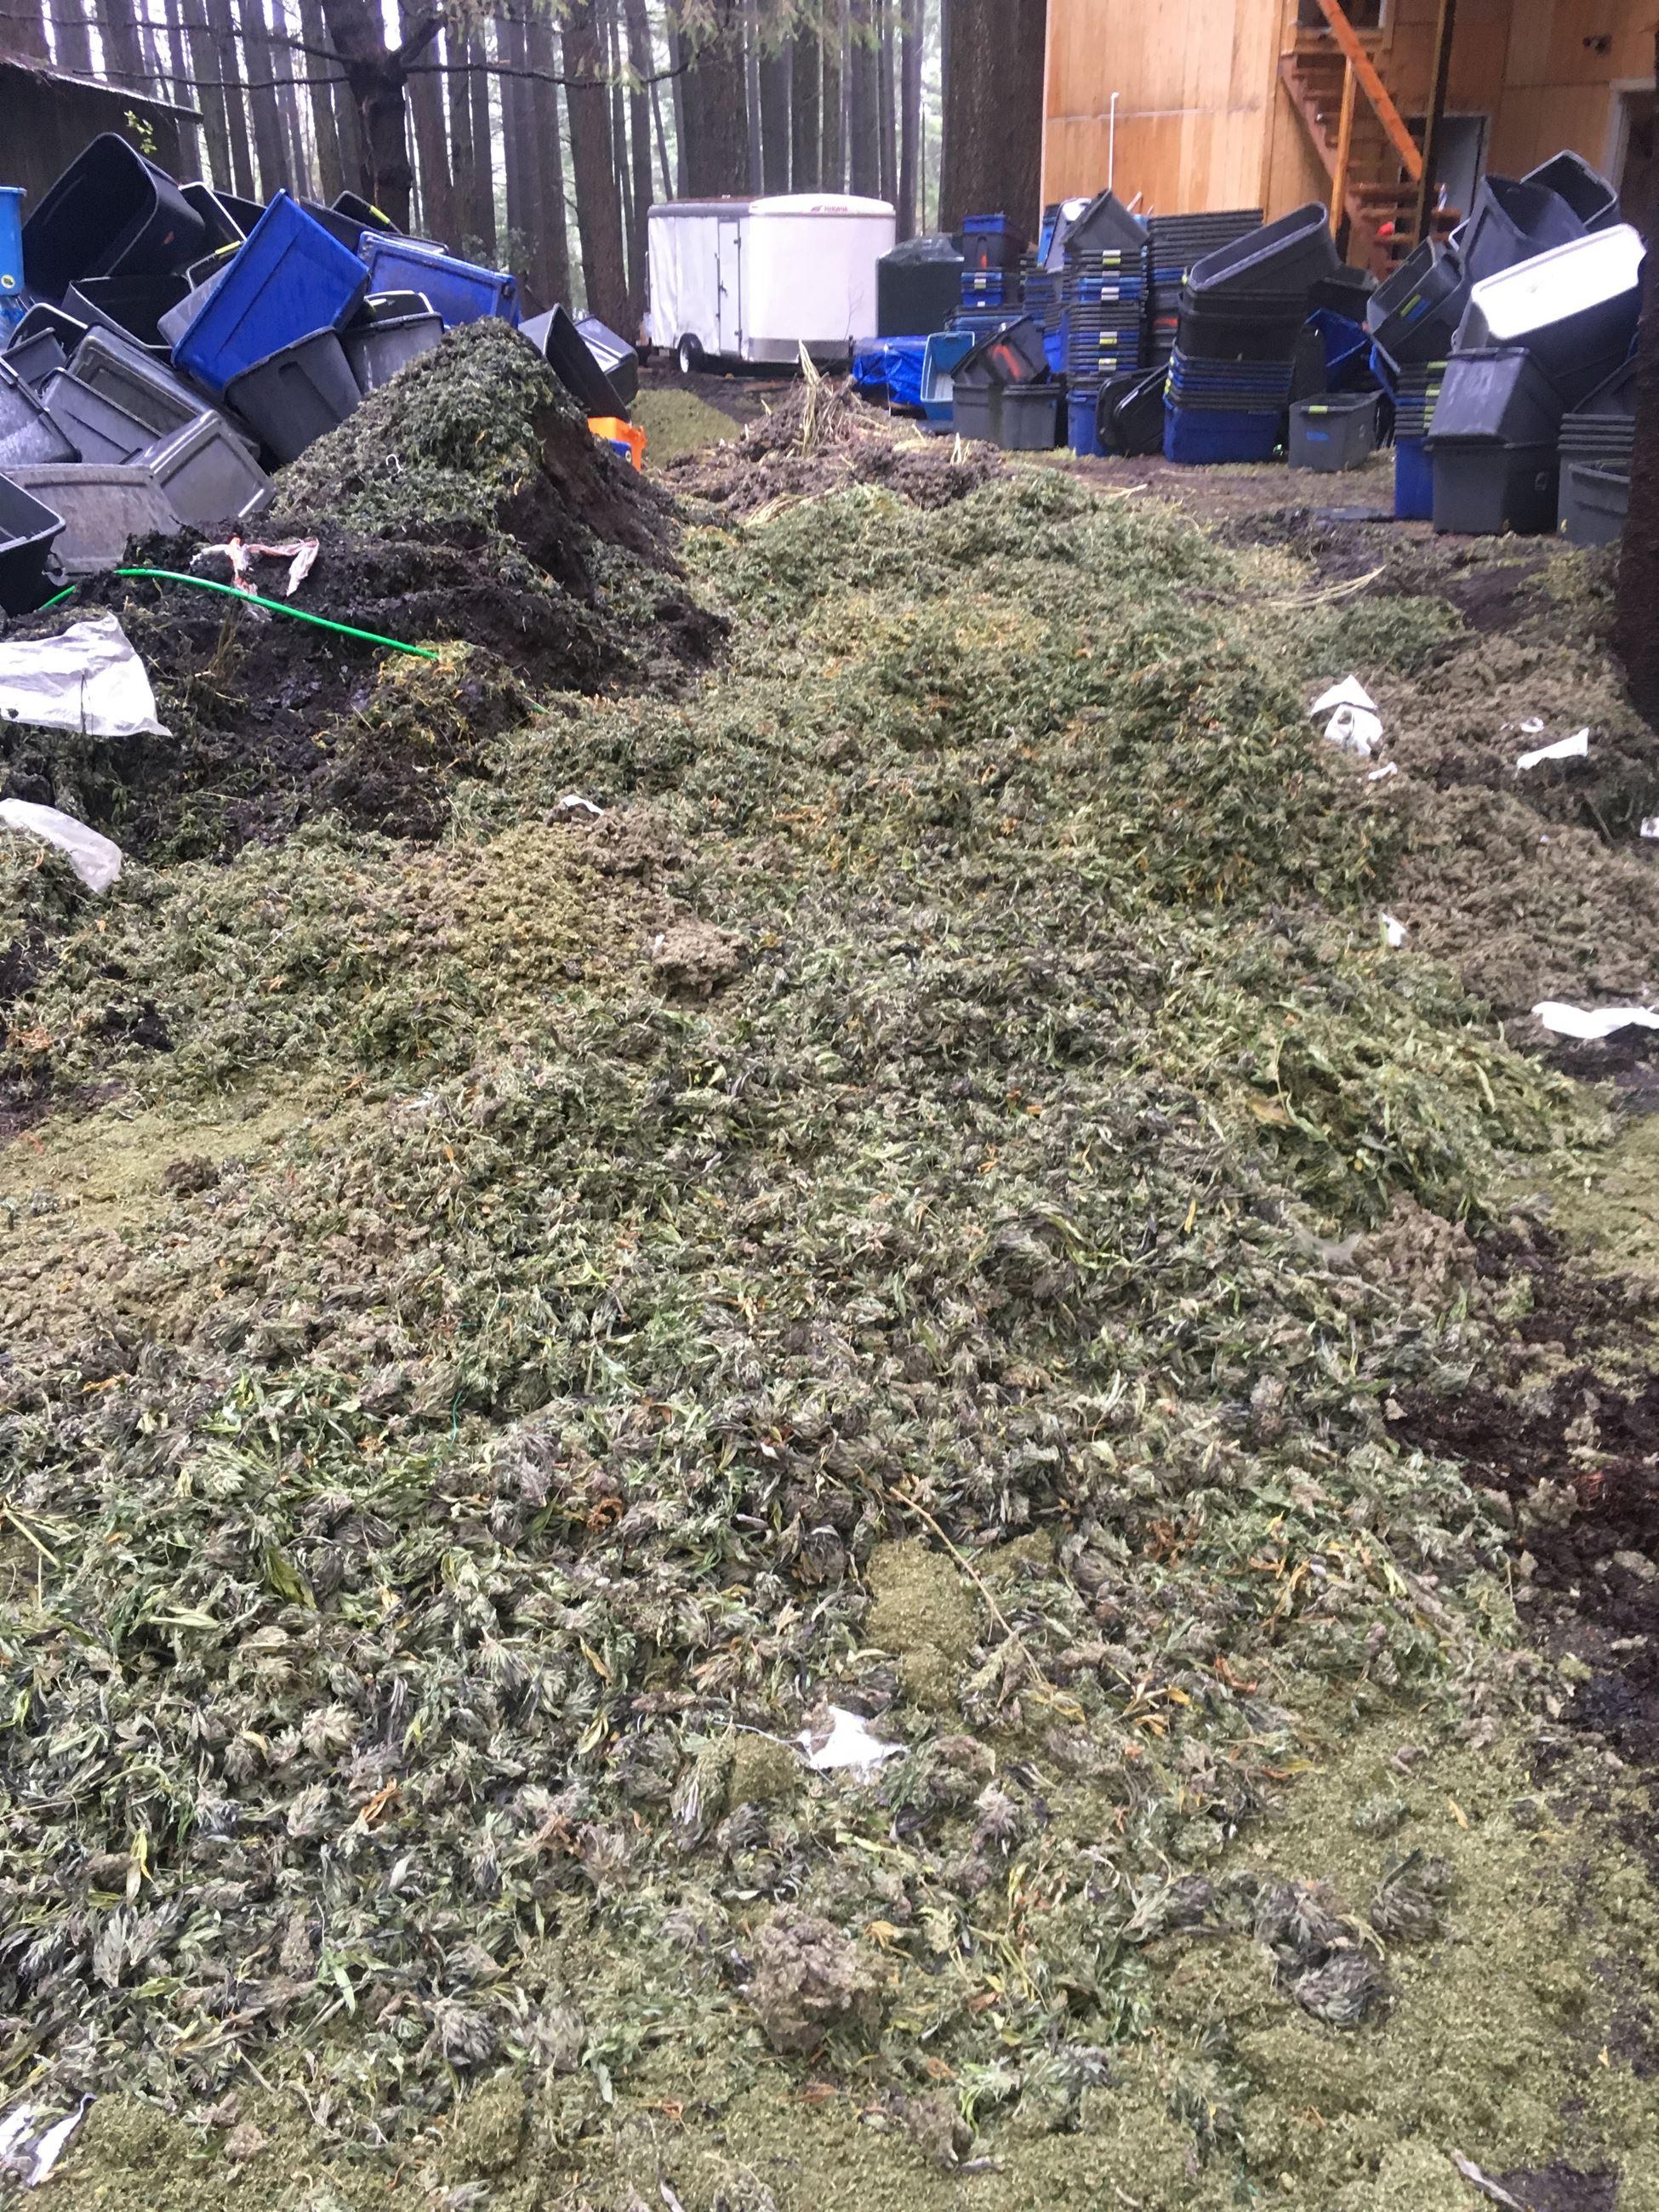 Cannabis being destroyed on scene